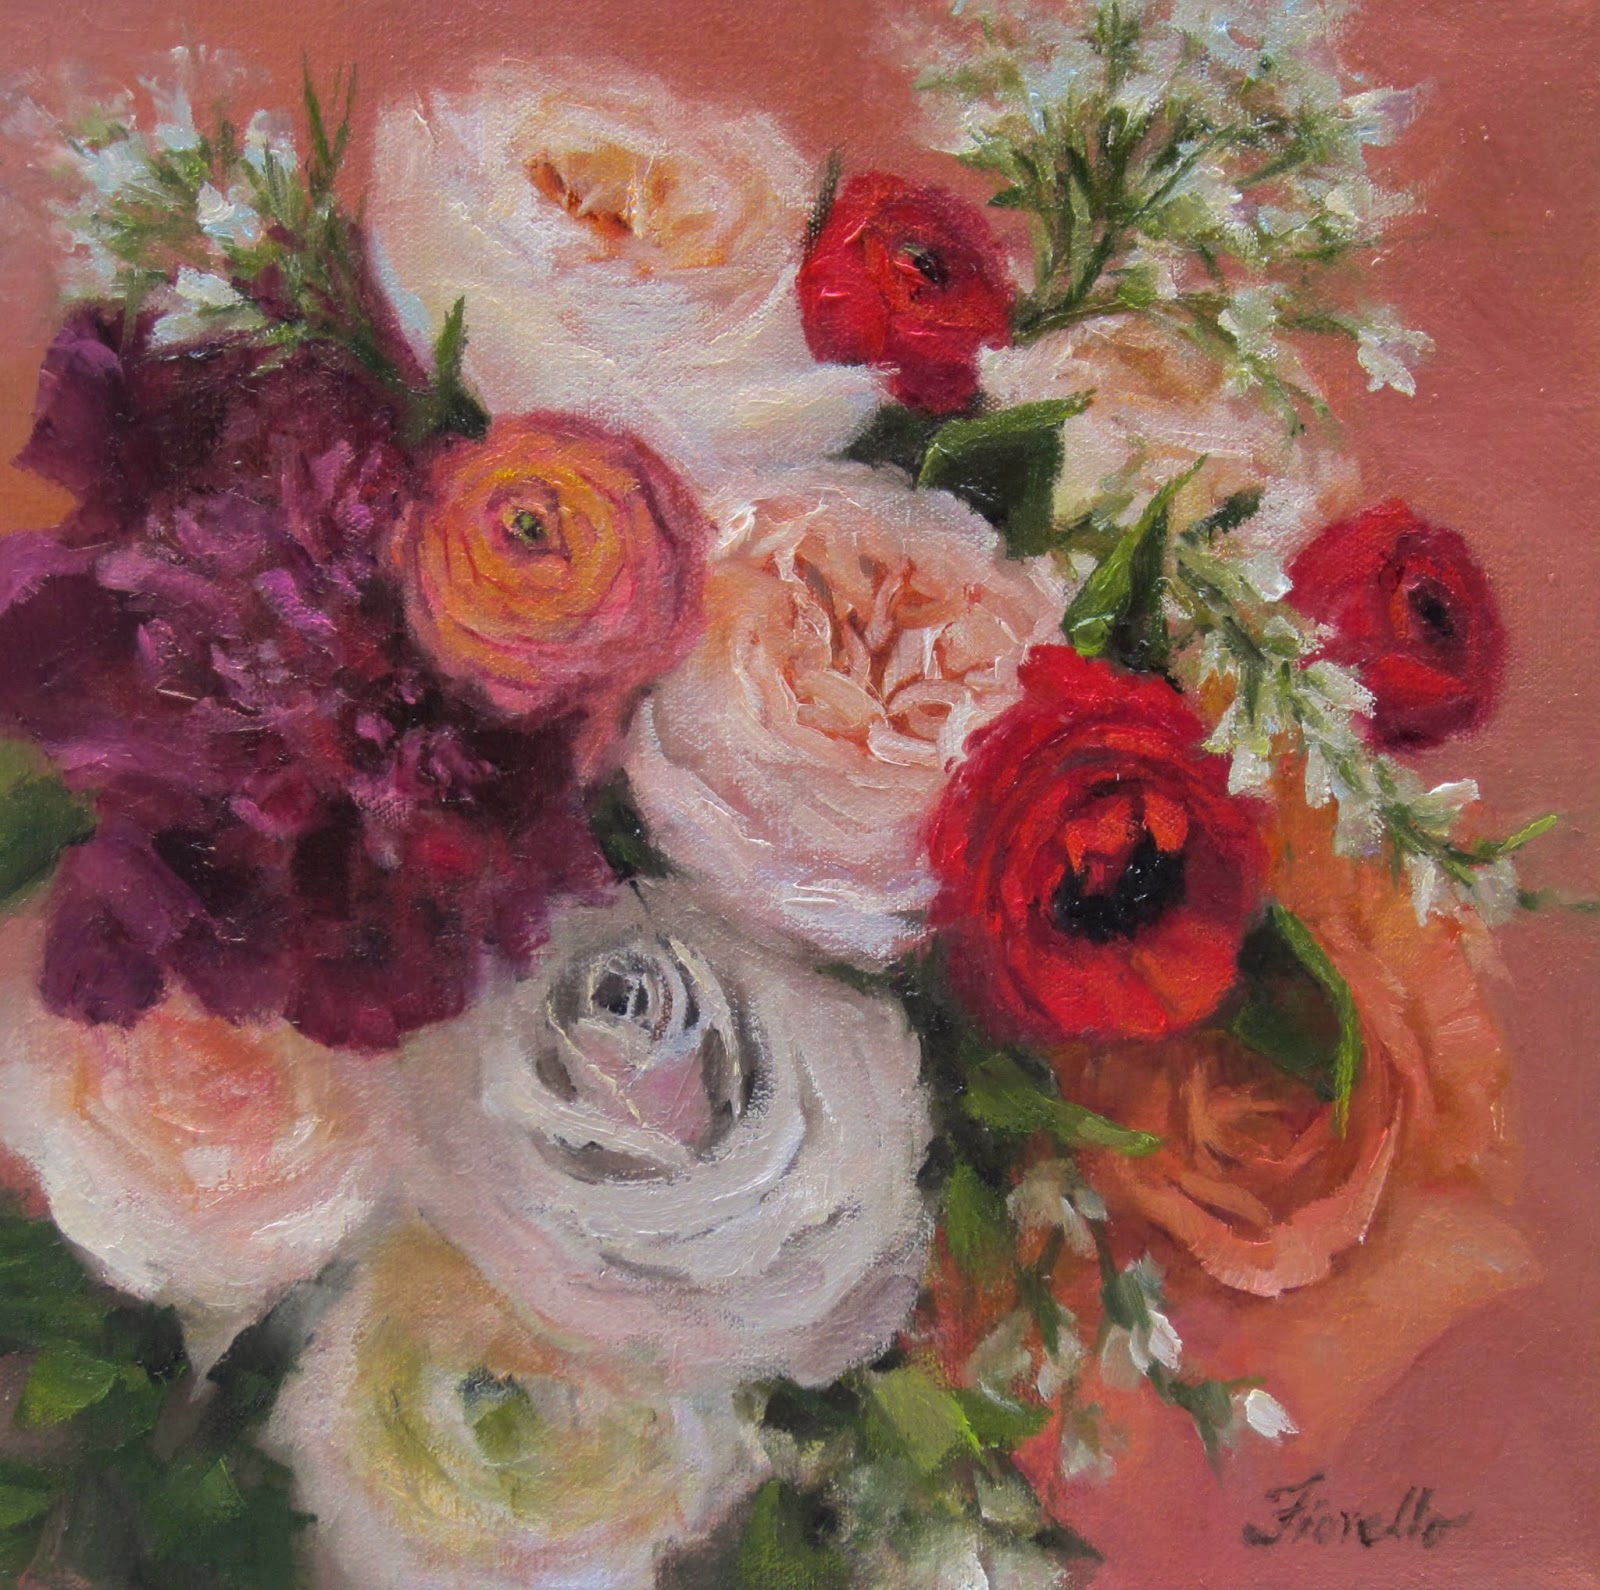 Pat Fiorello - Art Elevates Life: Bridal Bouquet Paintings